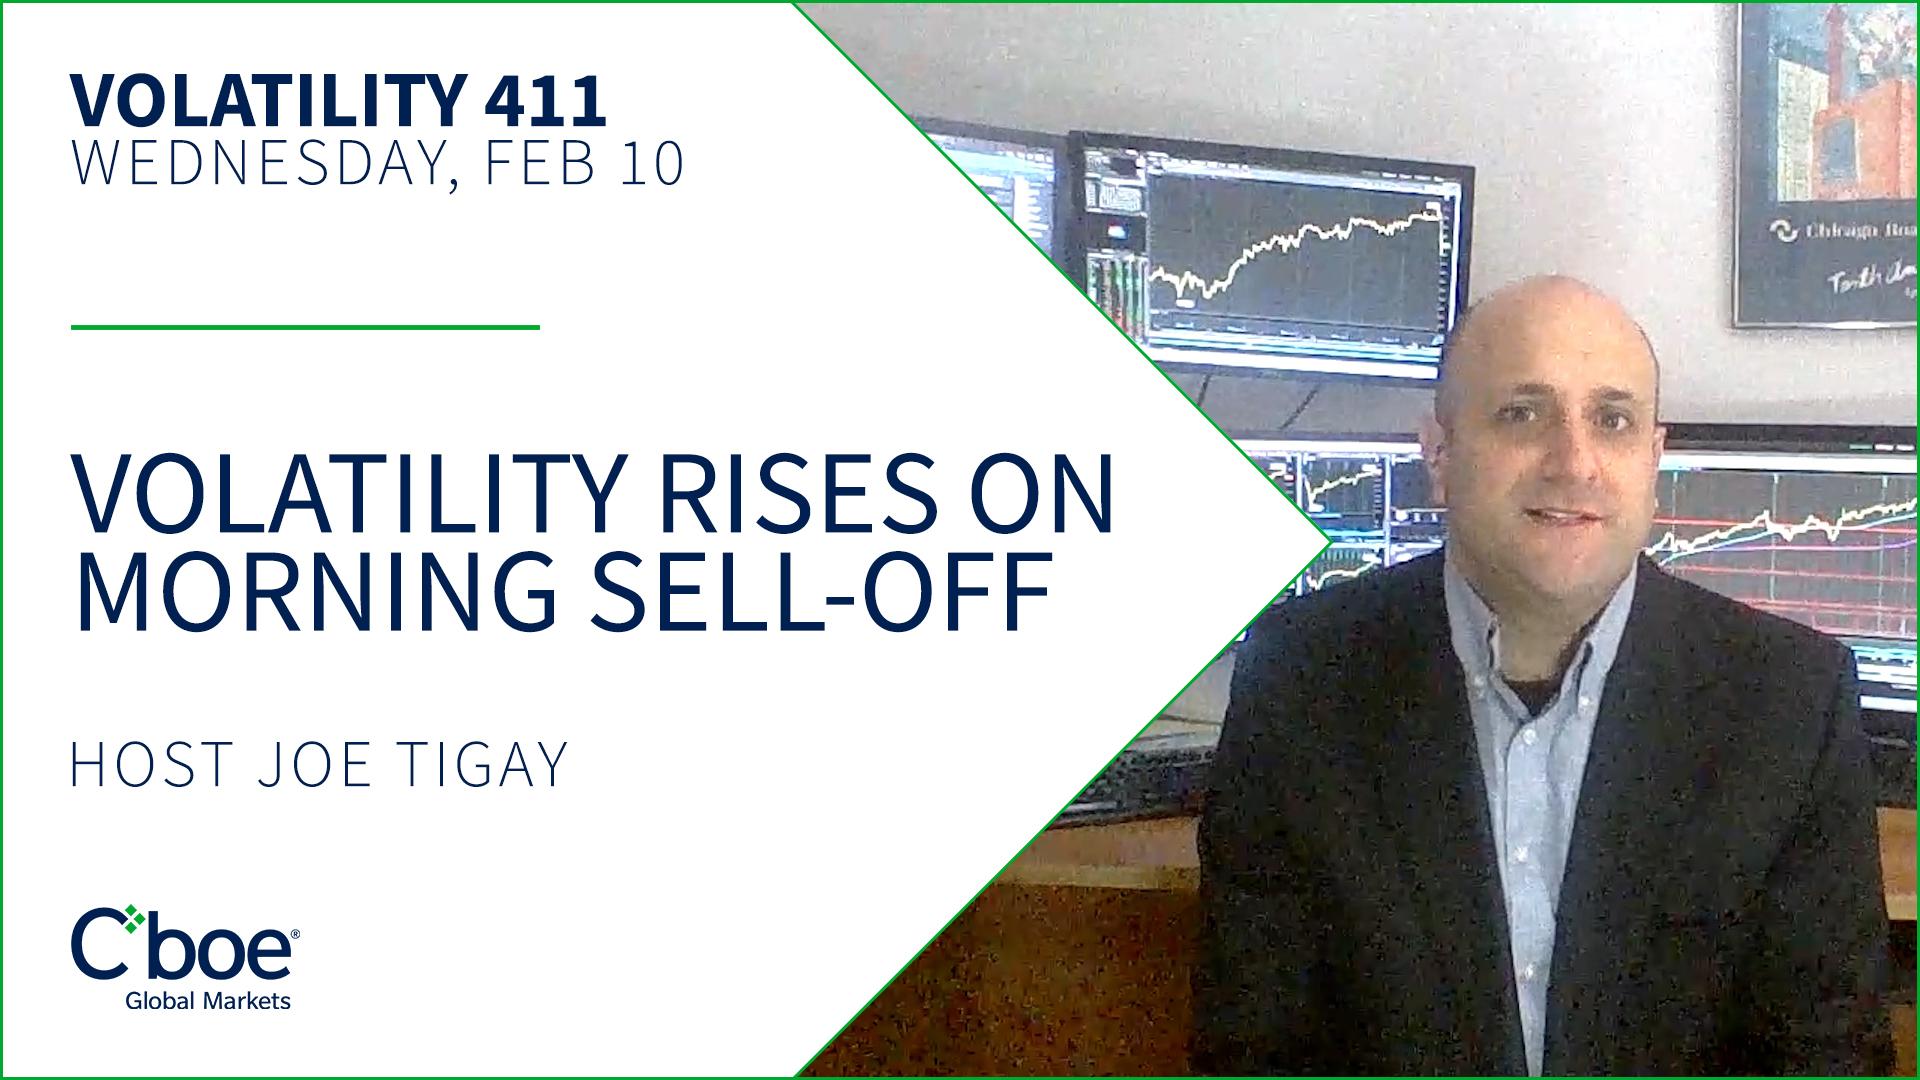 Volatility Rises on Morning Sell-Off Thumbnail